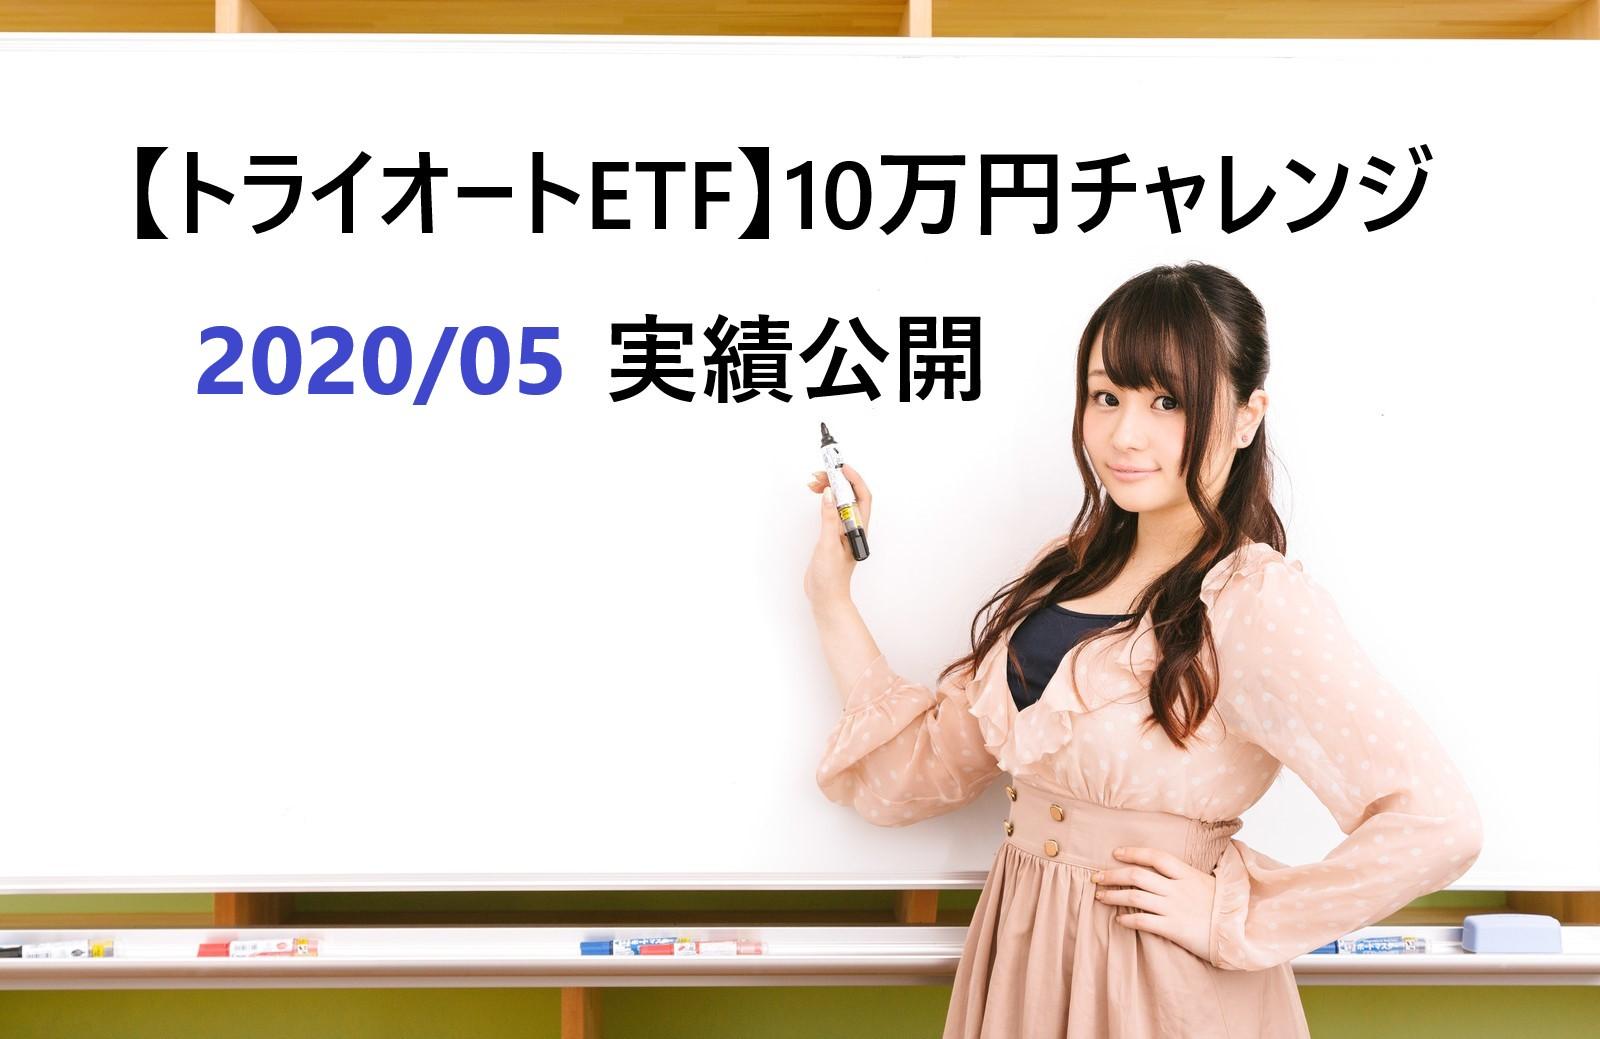 triauto-etf-challenge-202005